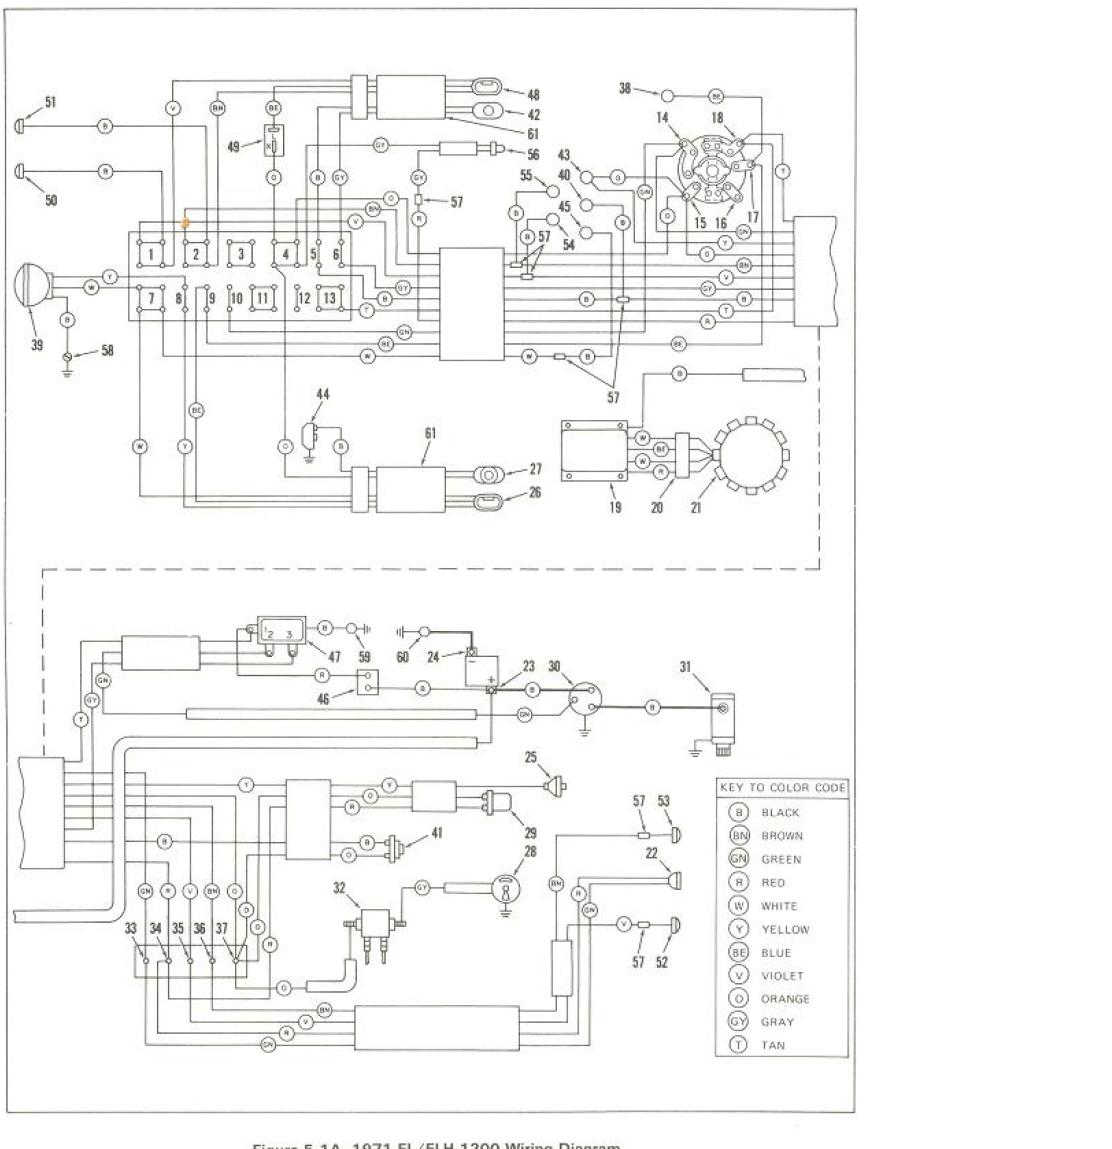 [DIAGRAM_0HG]  Cushman Golfster Wiring Diagram Diagram Base Website Wiring Diagram -  WIKIVENNDIAGRAM.RISTORANTE-DONGIO.IT | Cushman Truckster 36 Volt Wiring Diagram |  | Diagram Base Website Full Edition - ristorante-dongio